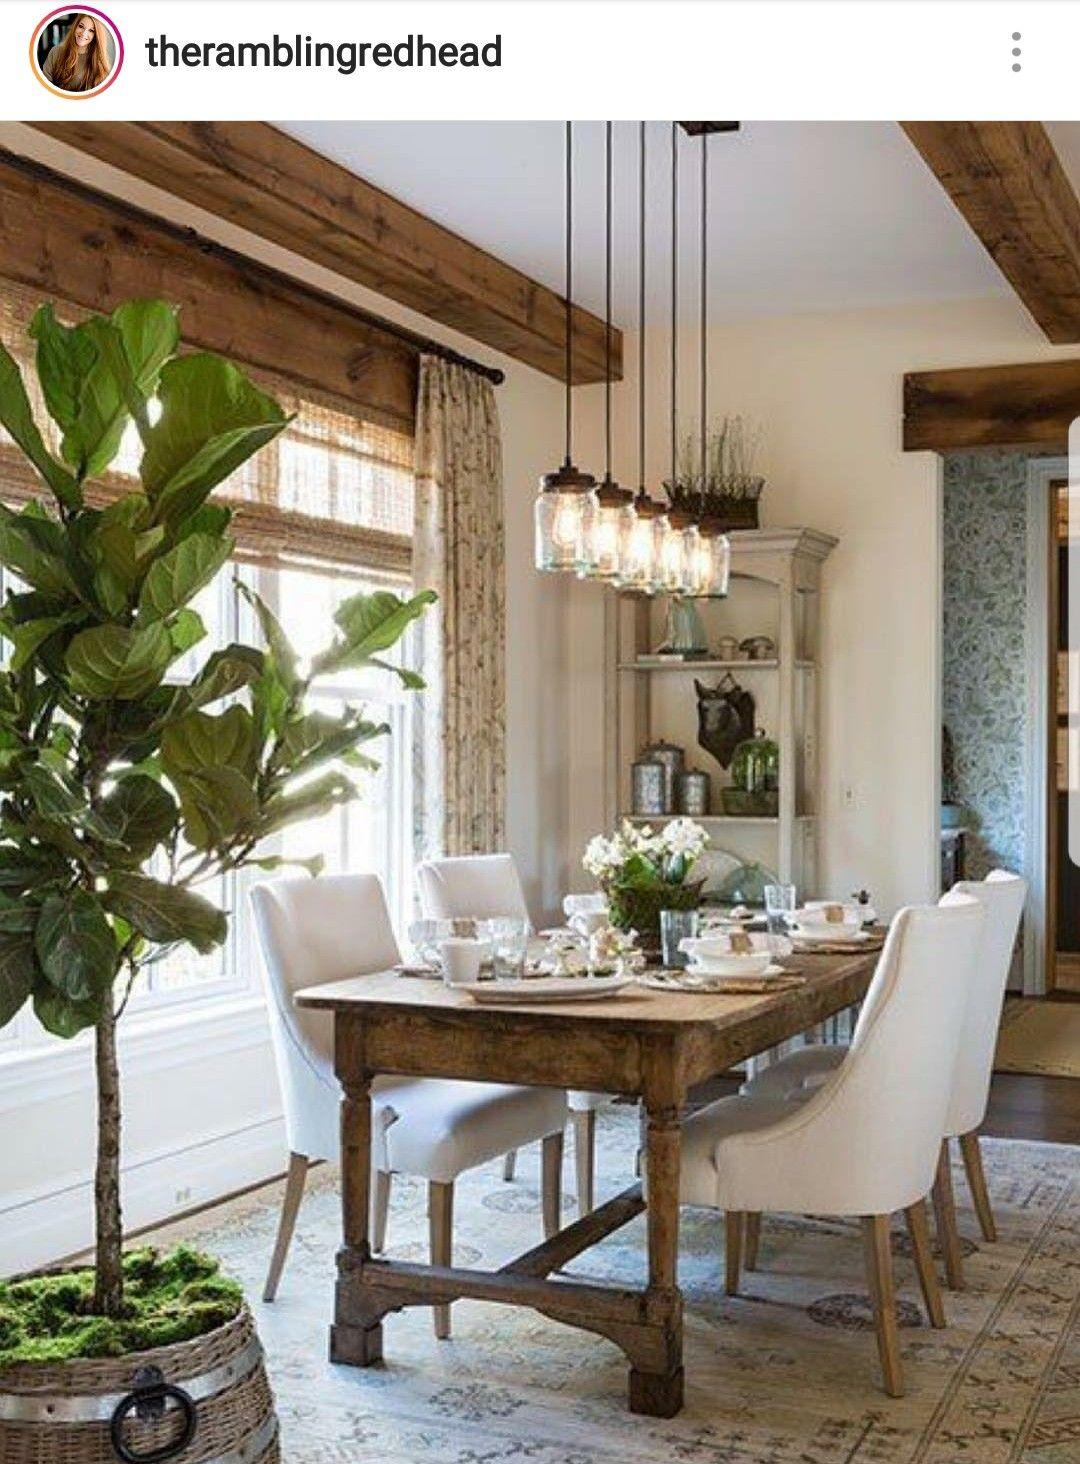 Gorgeous farmhouse dining room. Life the big farmhouse beams